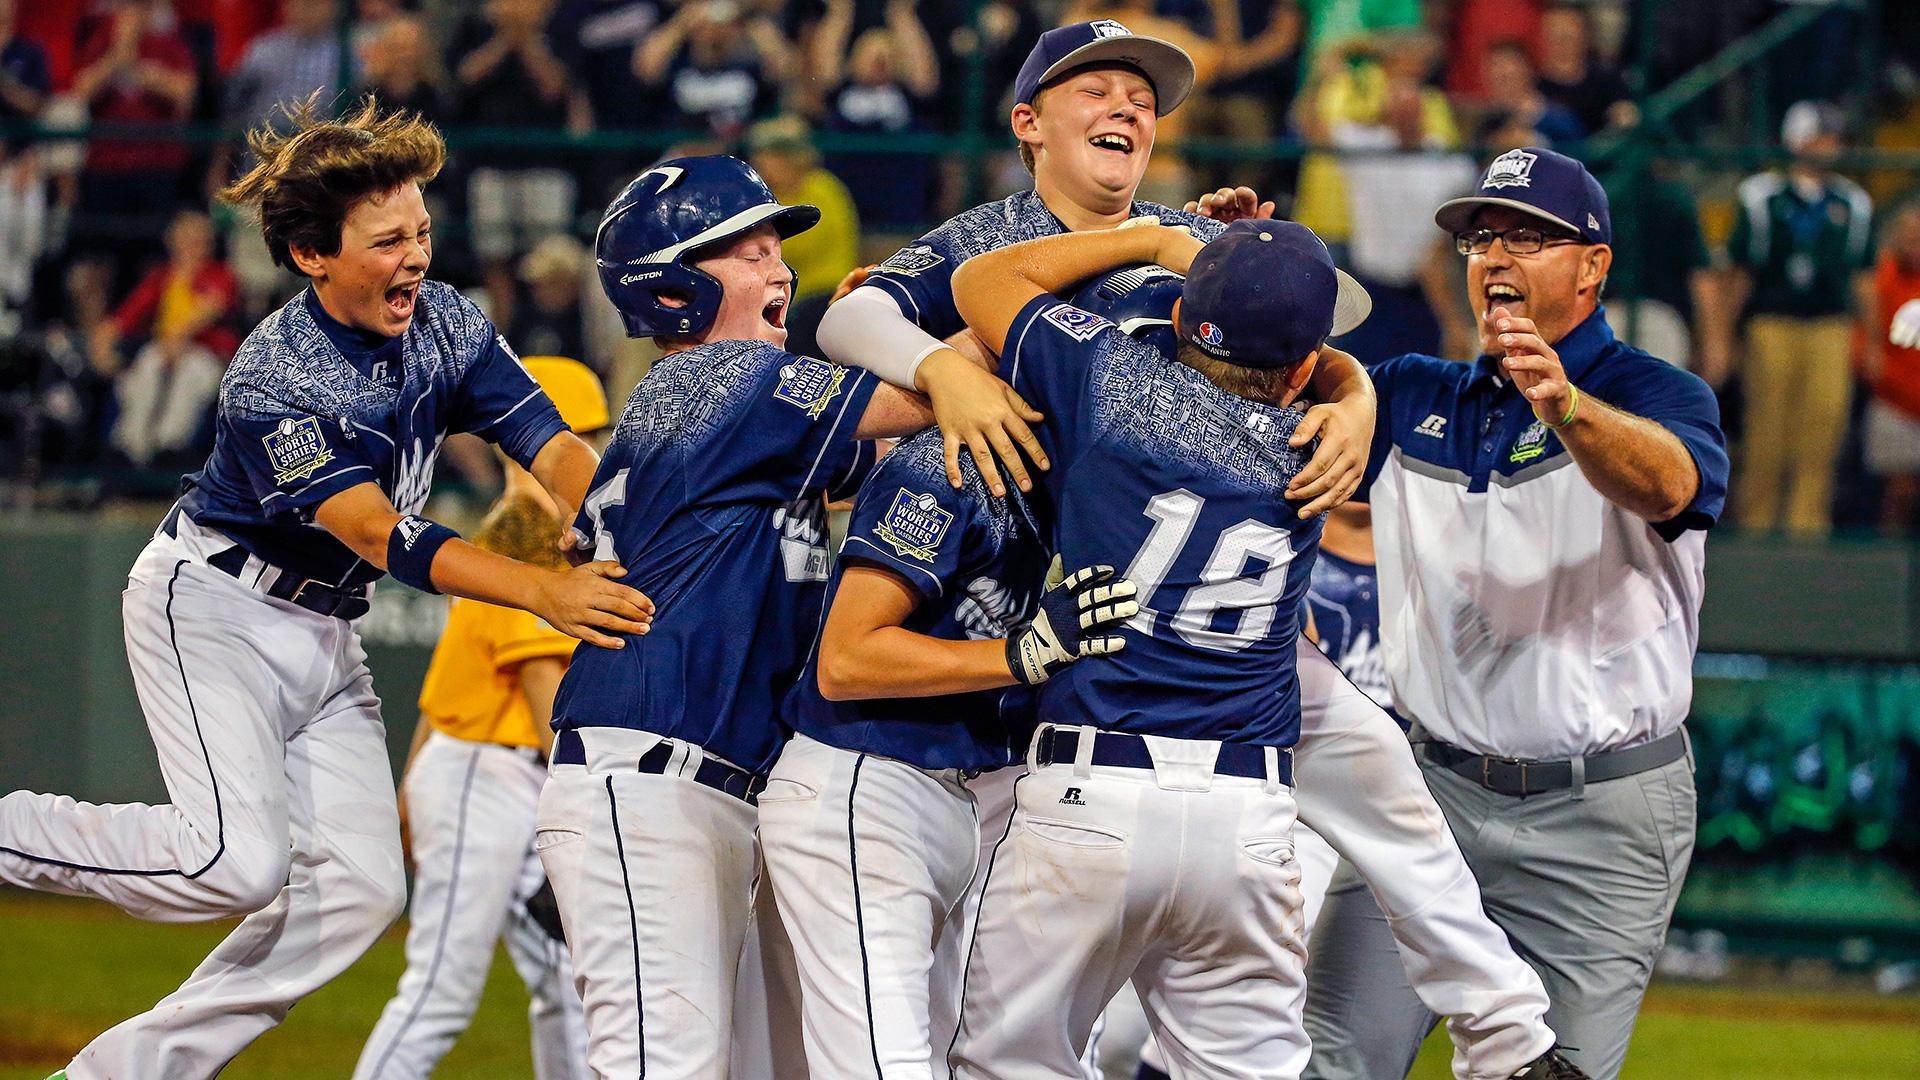 Pennsylvania-Little-League-World-Series-082315-AP-FTR.jpg